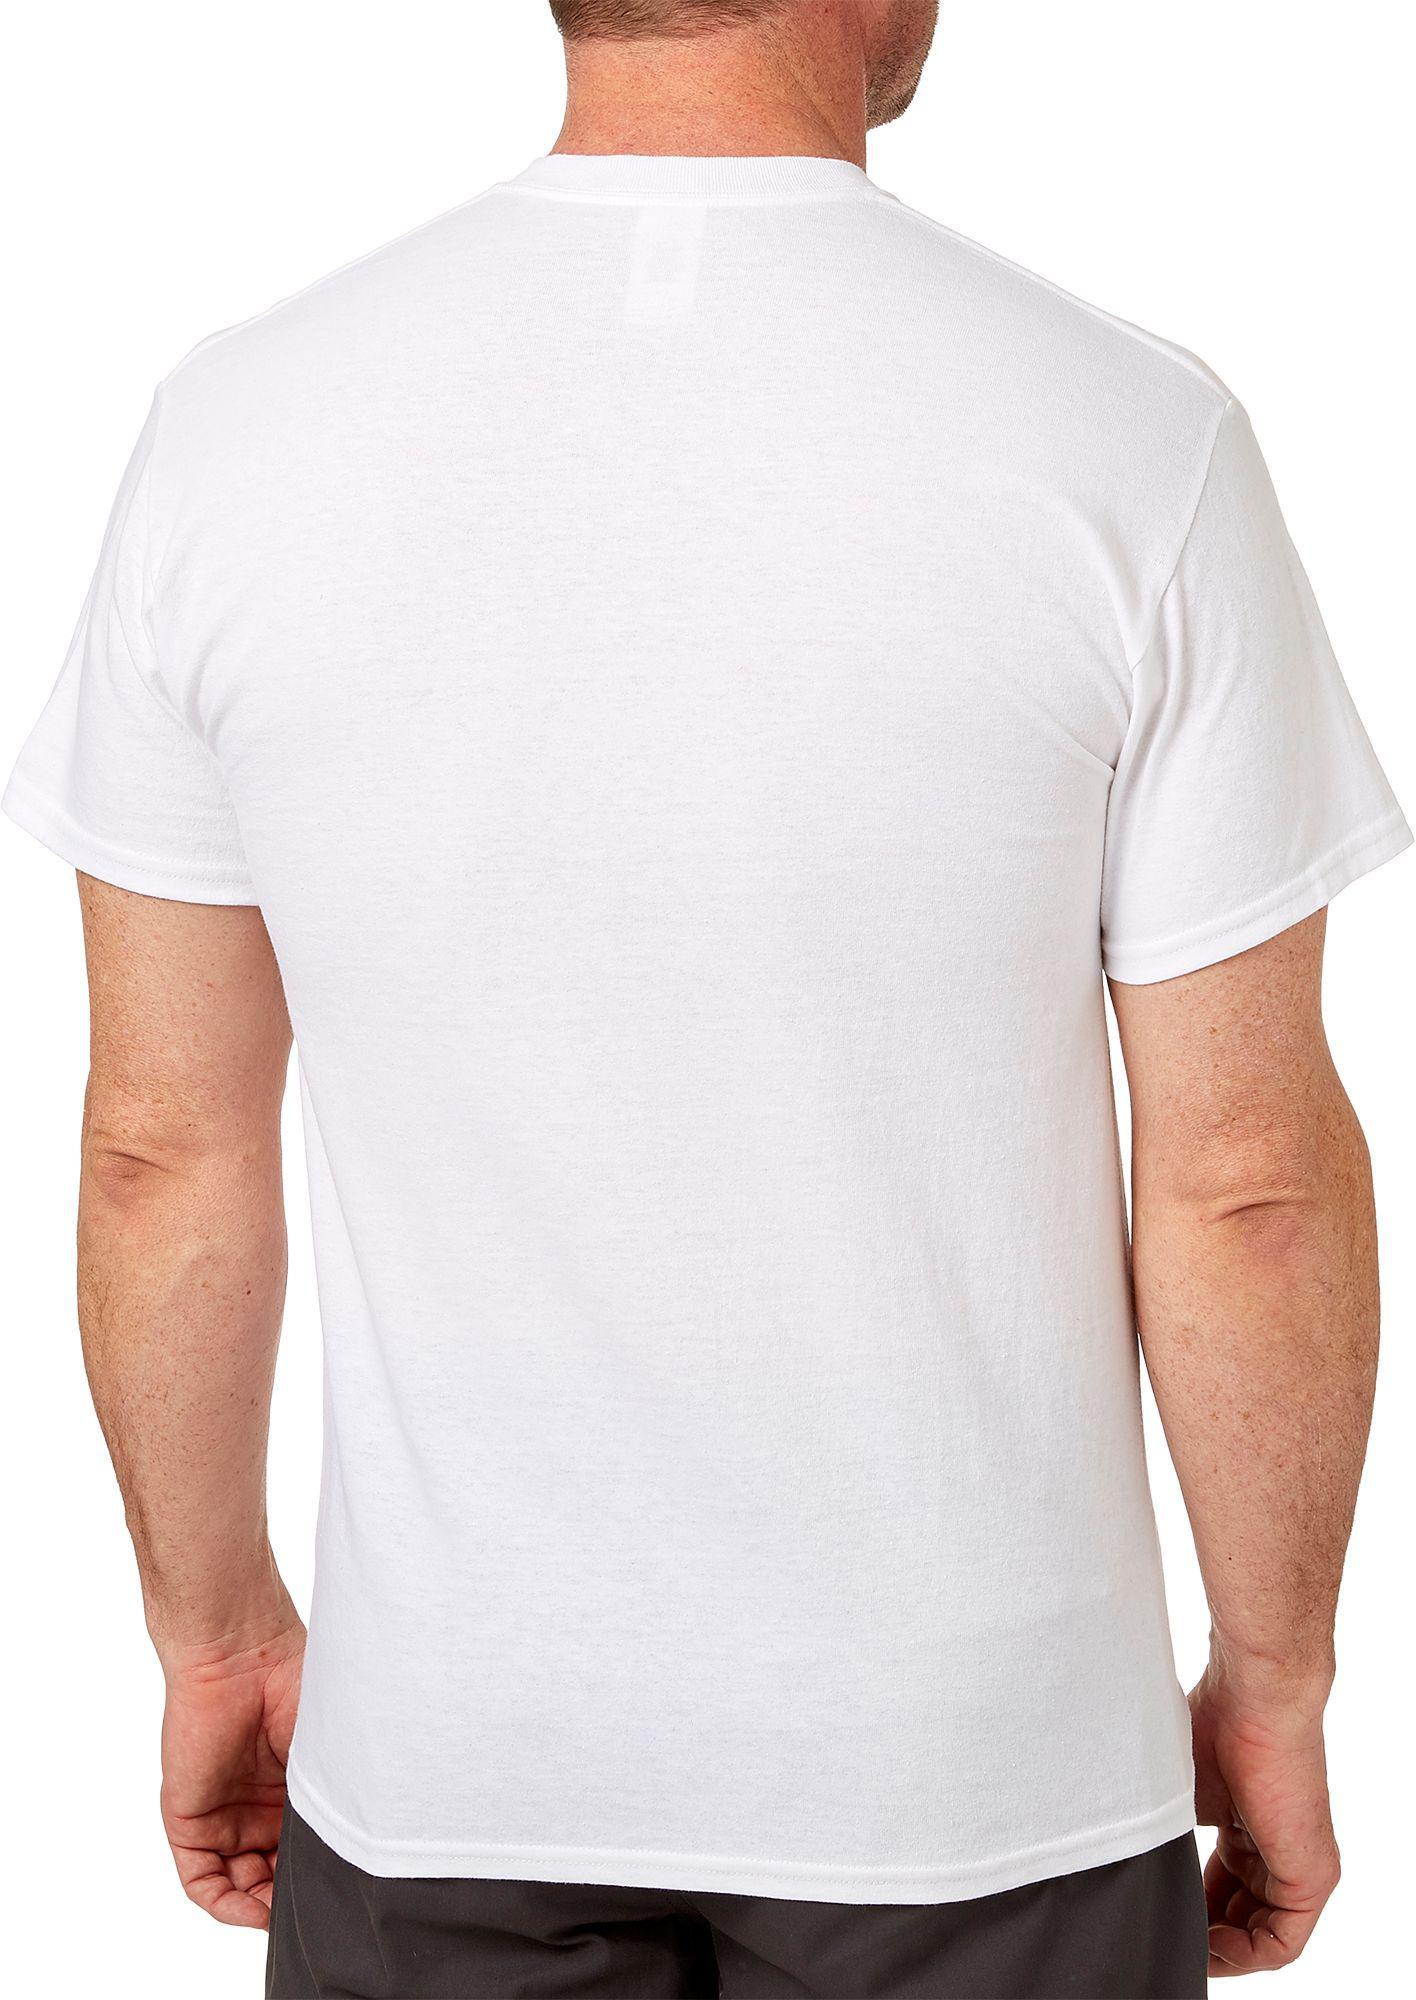 8298b71401 DICK'S Sporting Goods Short Sleeve Americana T-shirt in White for ...